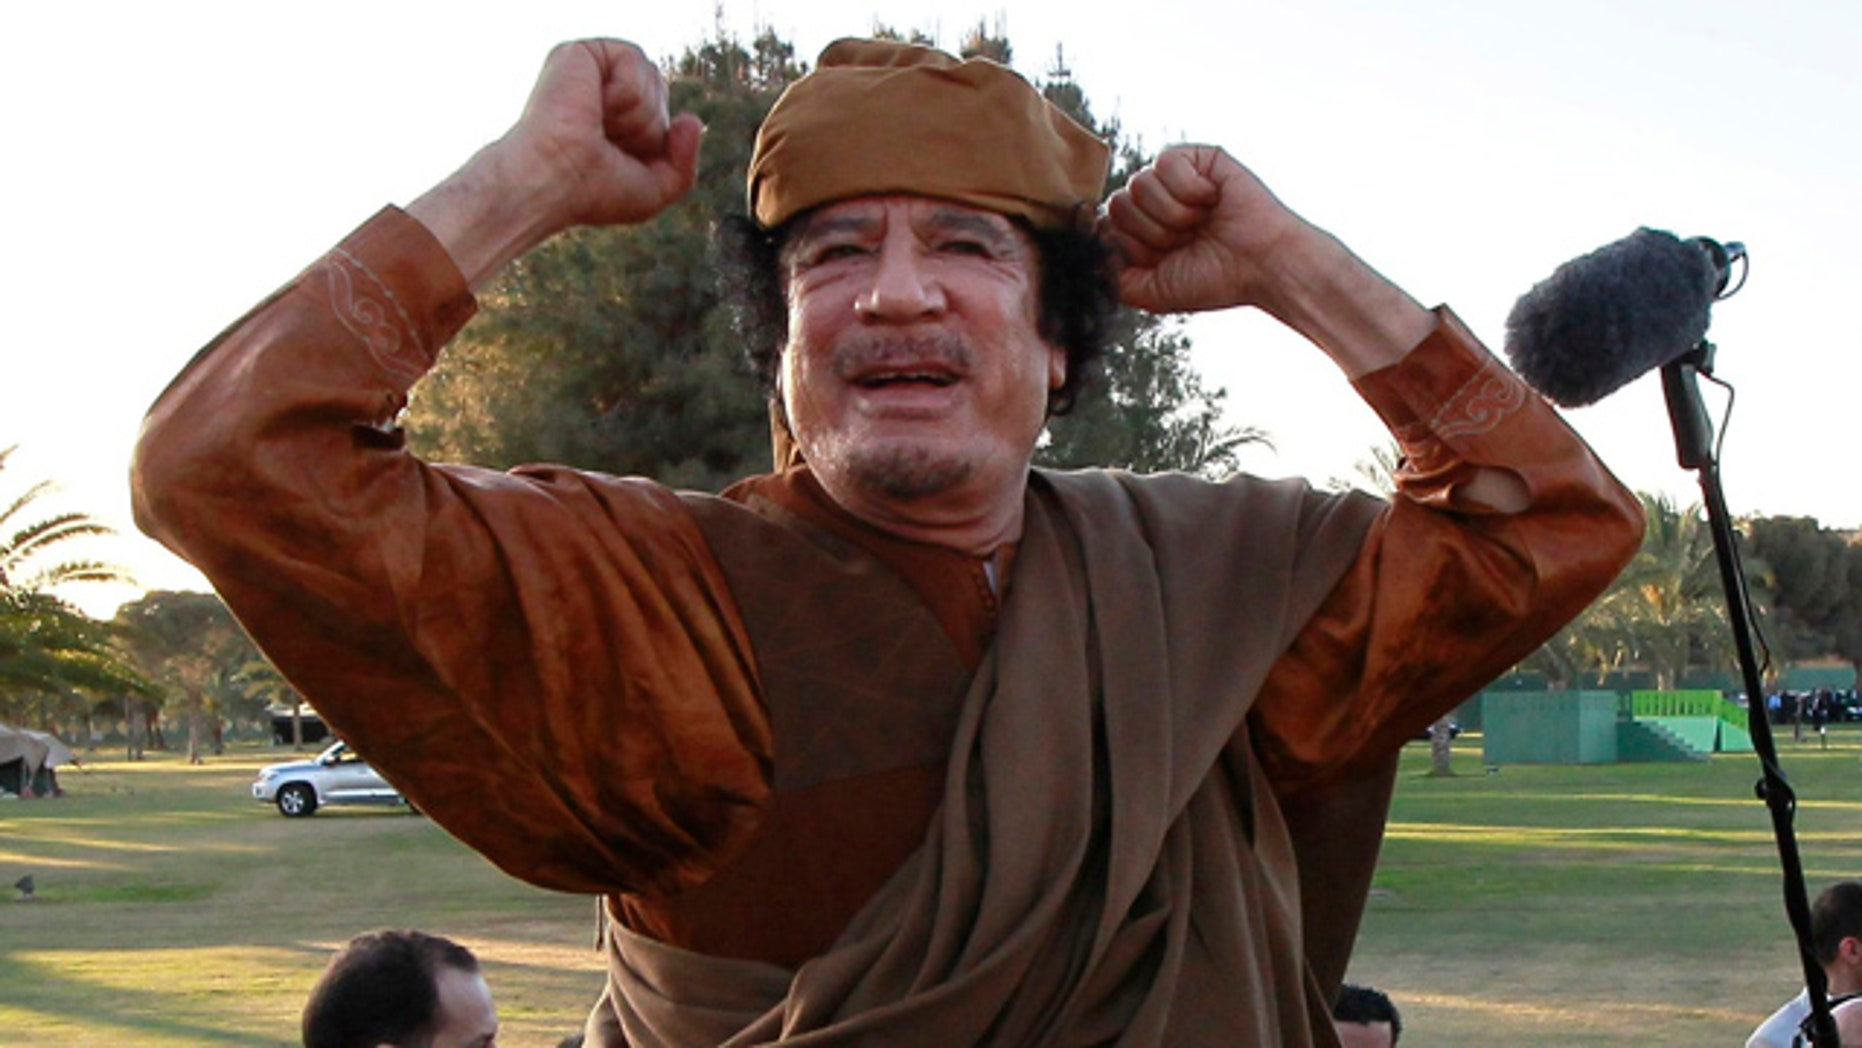 April 10: Libyan leader Muammar al-Qaddafi gestures to his supporters in Tripoli, Libya.